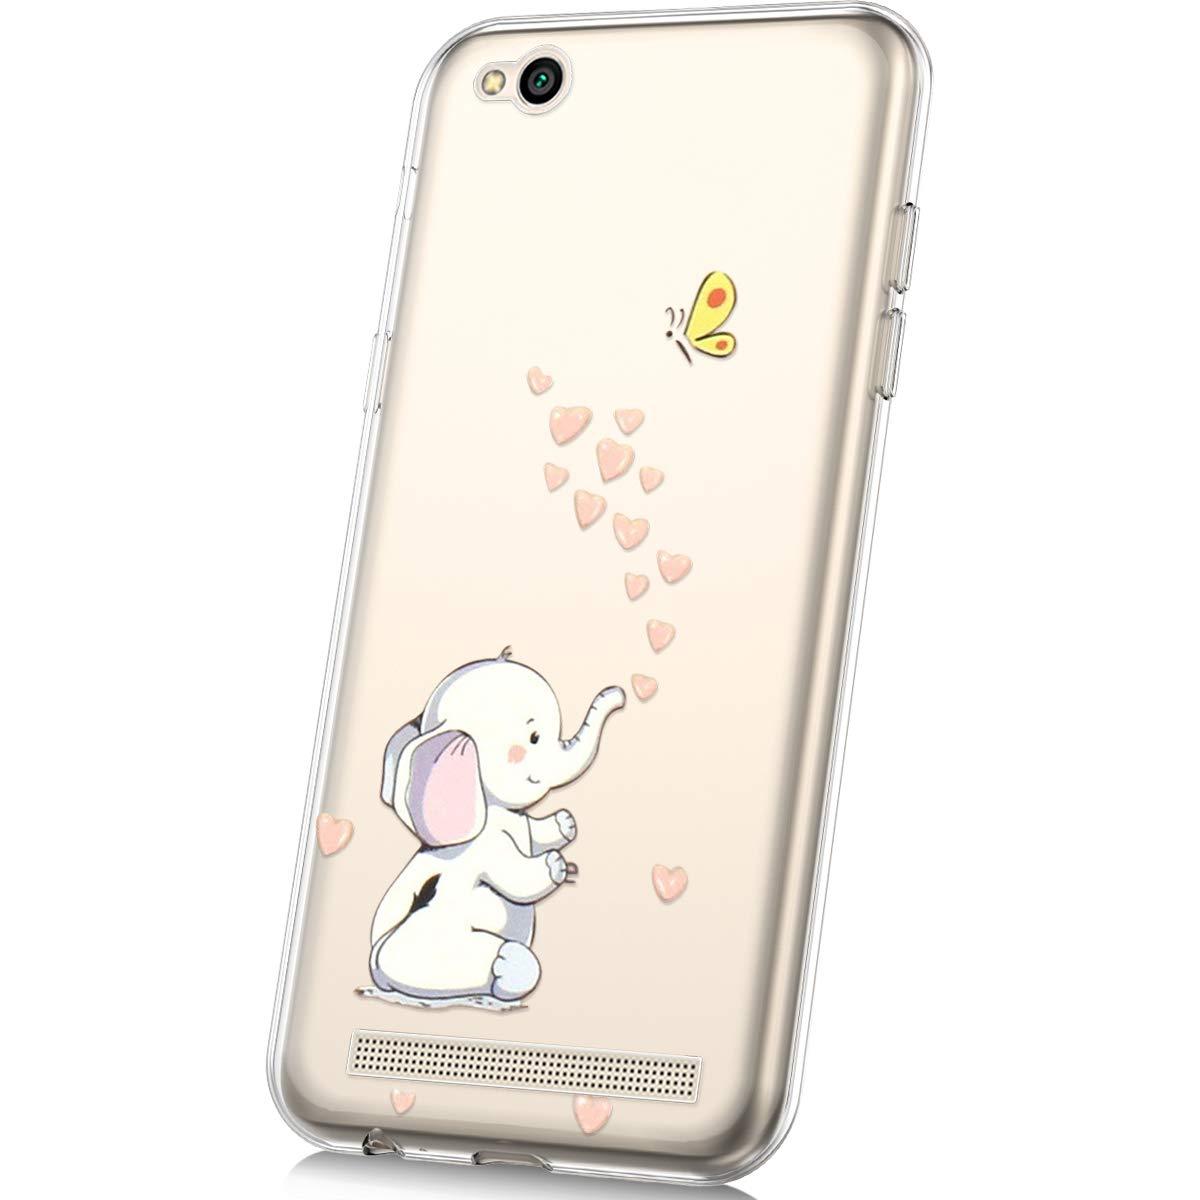 JAWSEU Funda Compatible con Xiaomi Redmi 5A Transparente Suave TPU Silicona Gel Funda con Dibujos Animados Dise/ño Ultra-Delgado Anti-ara/ñazos Resistente Protectora Carcasa,Flamenco